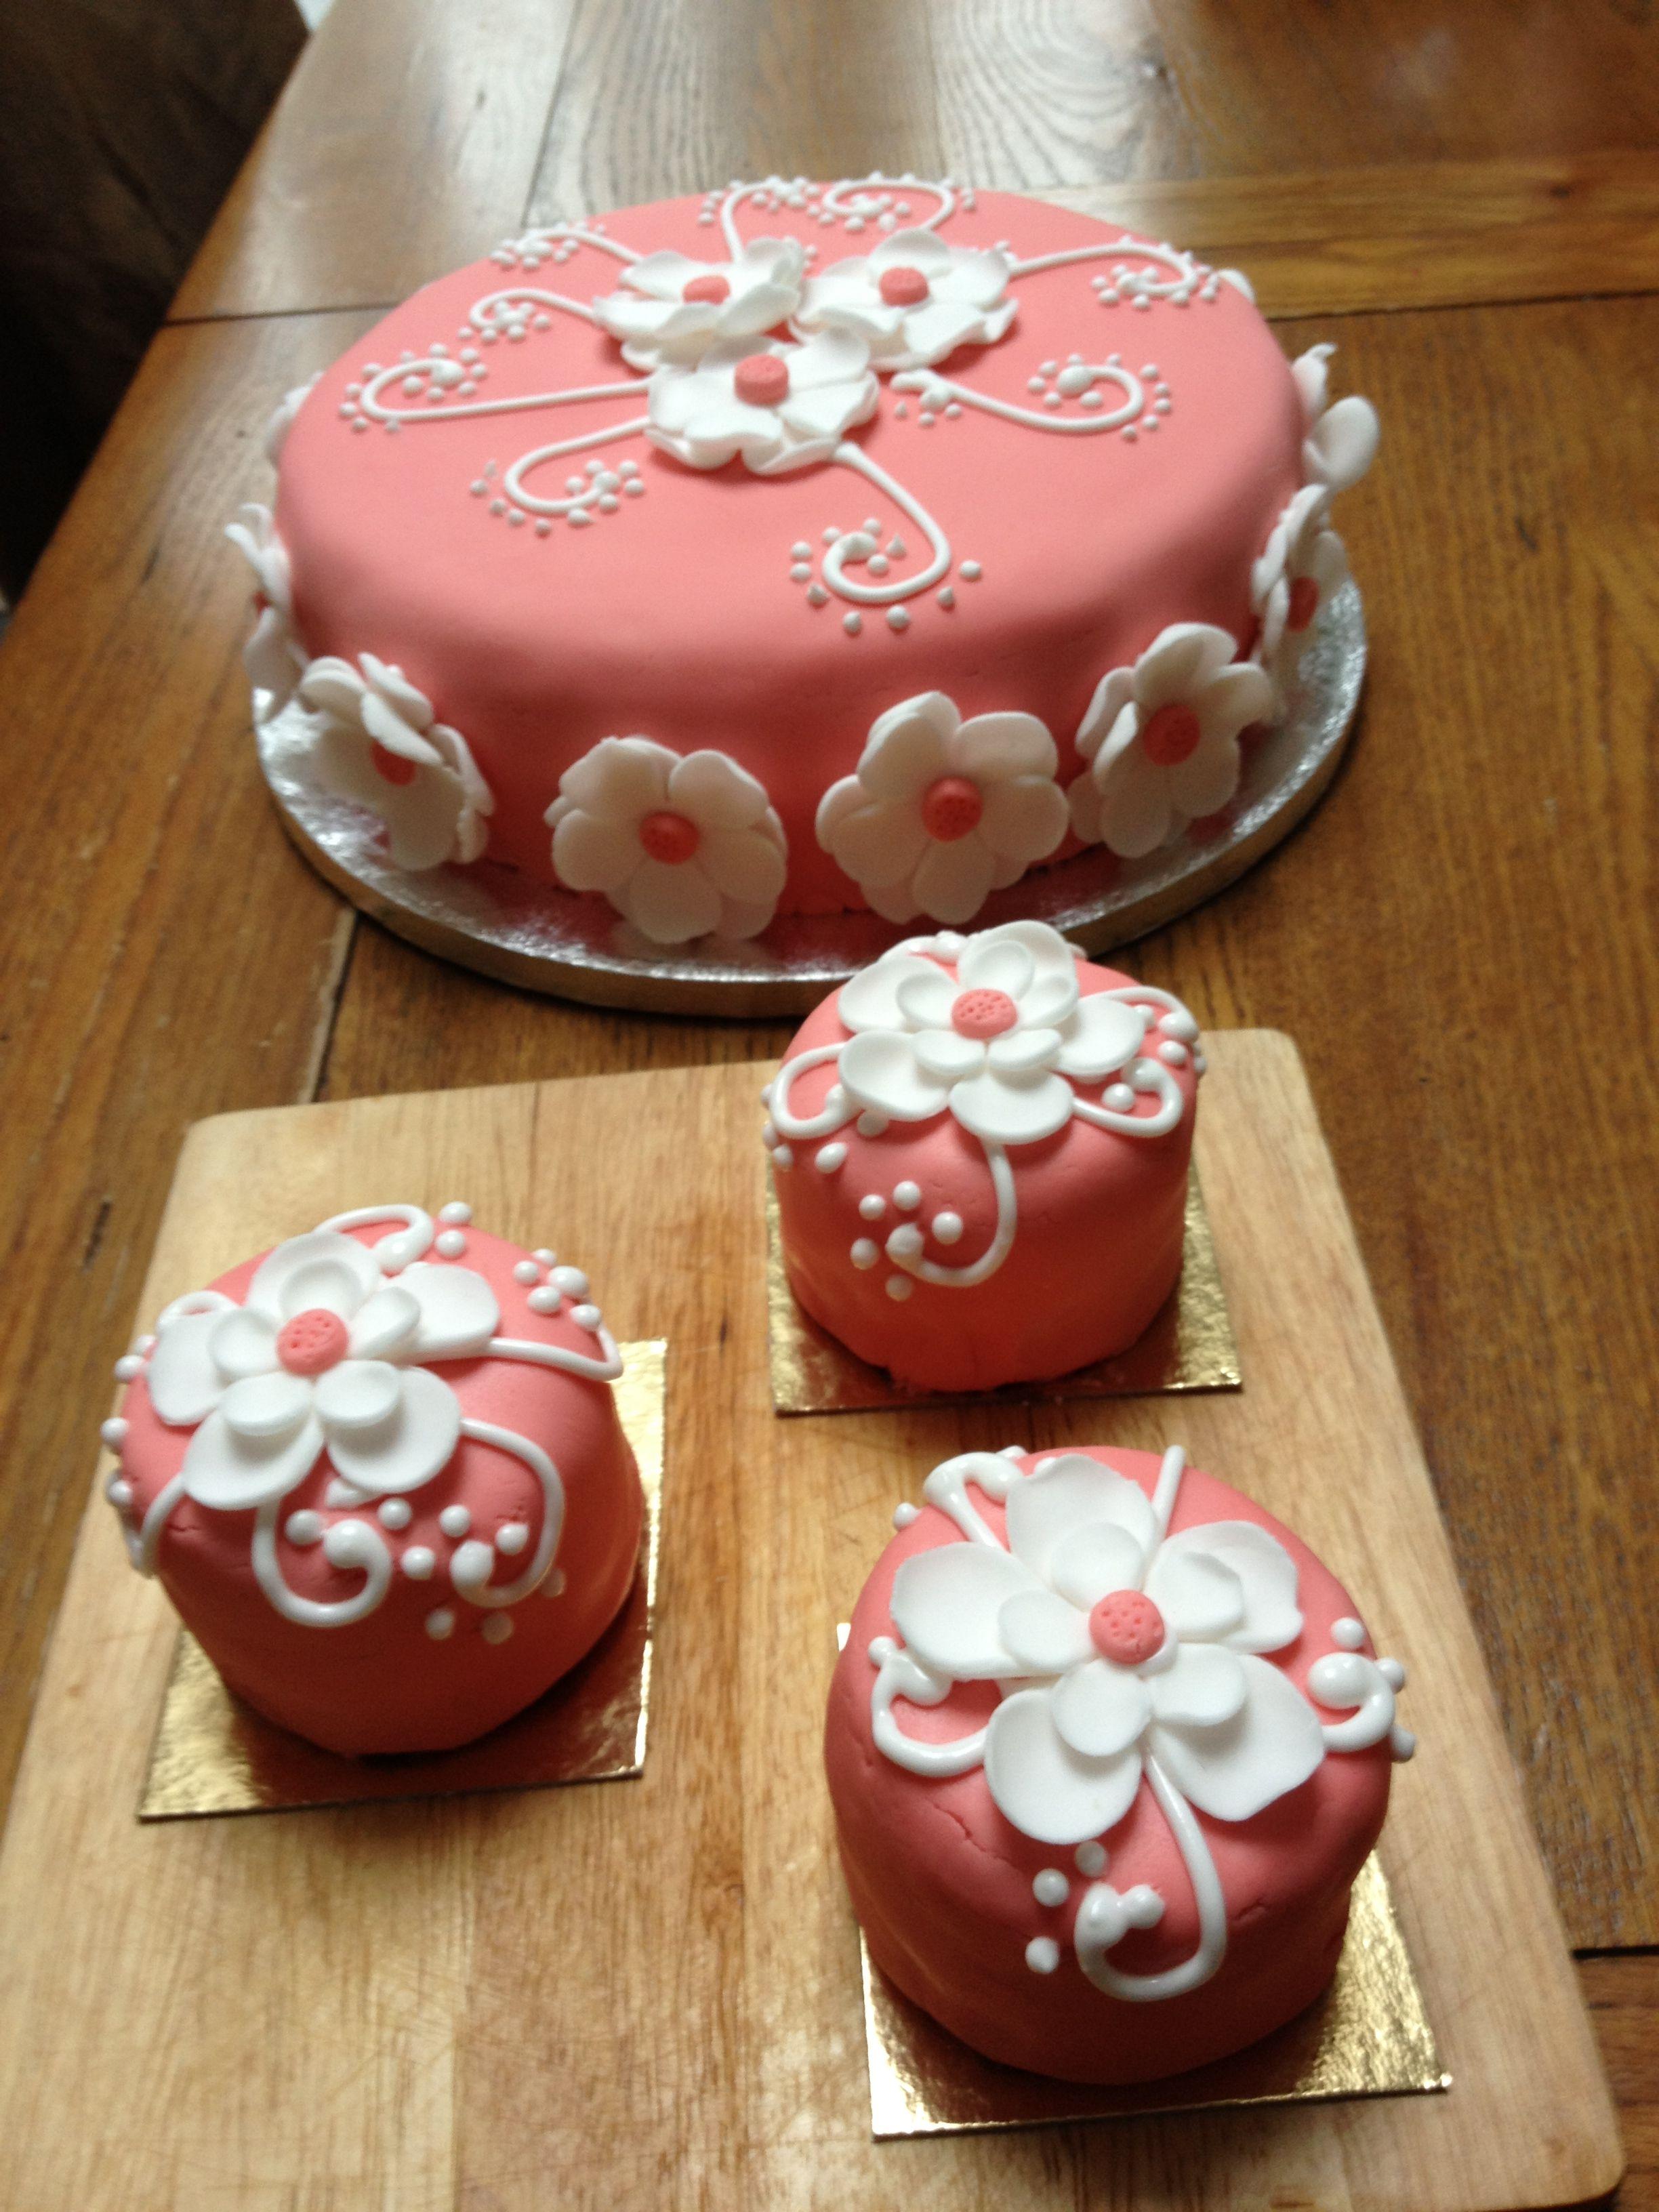 My Newest cake creation